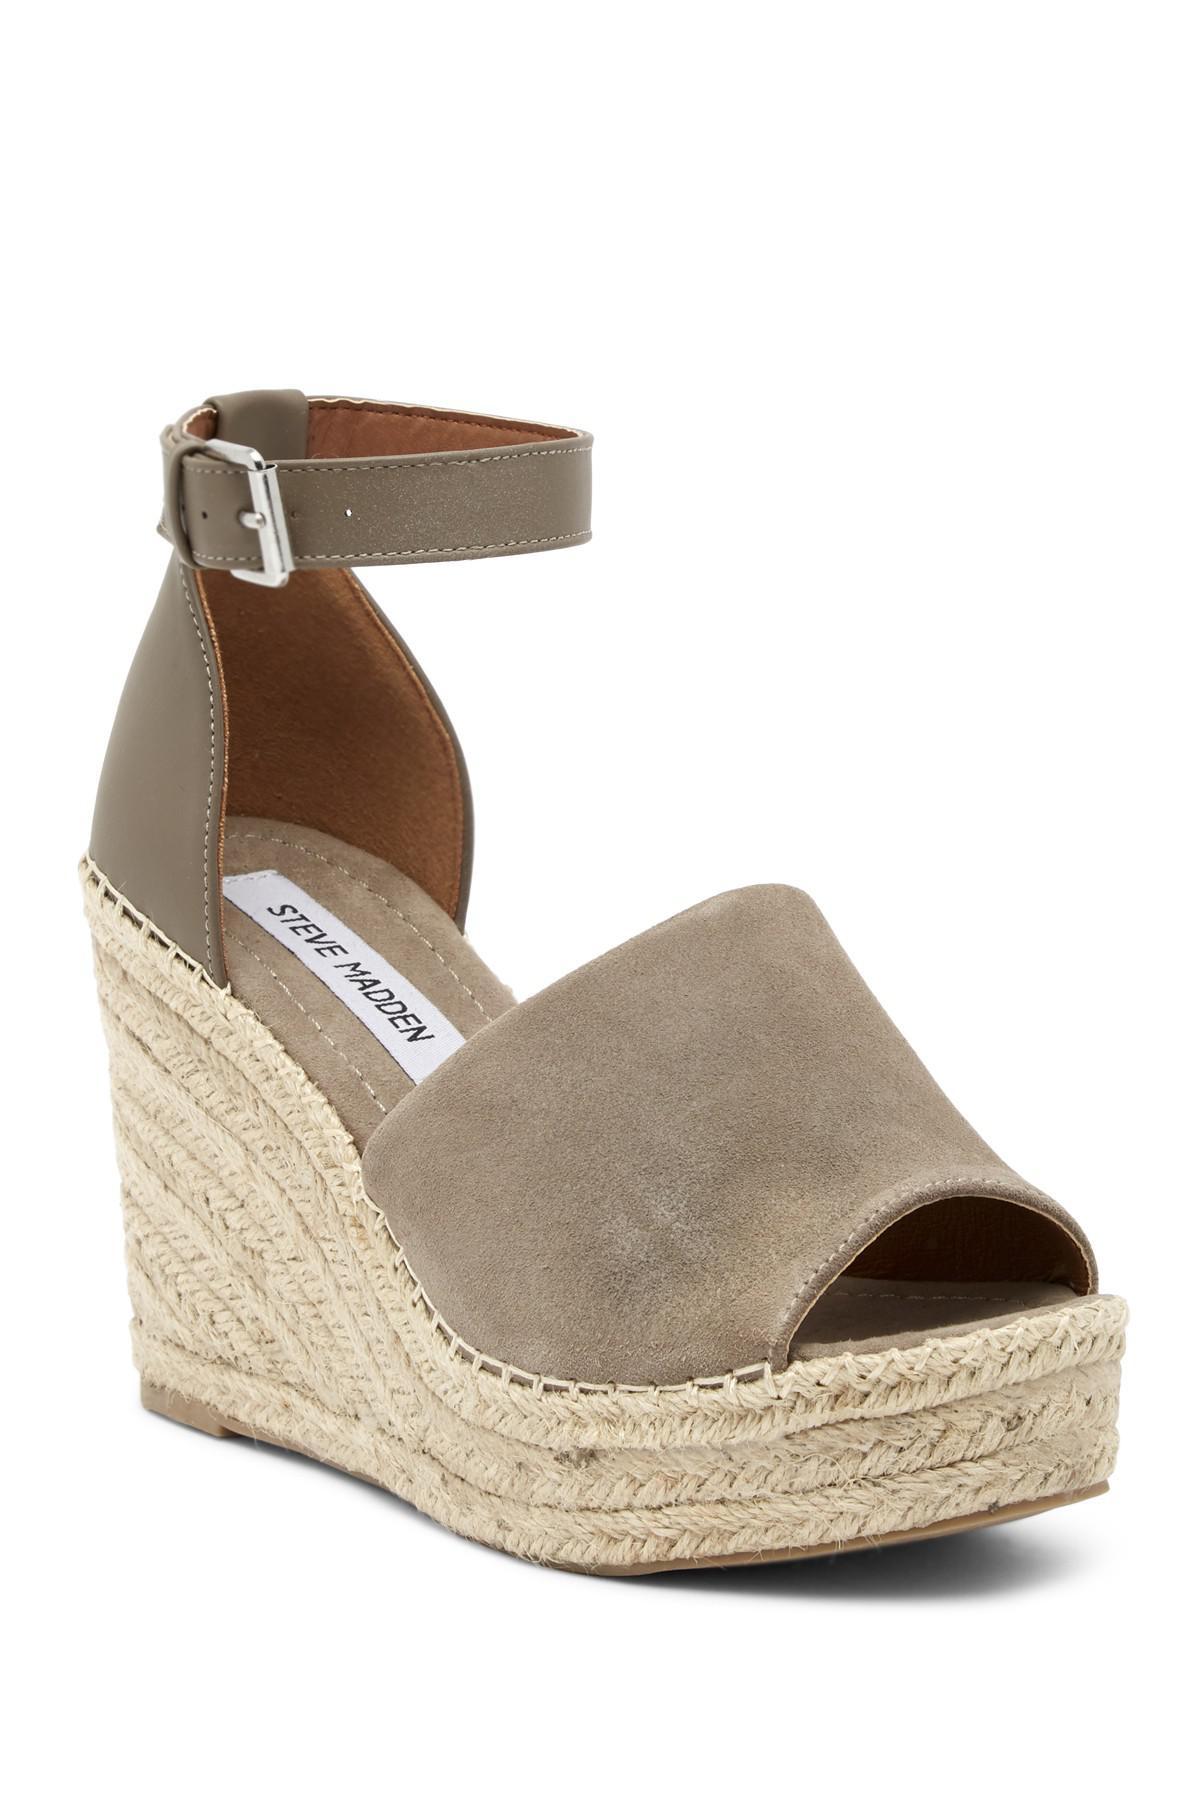 Steve Madden. Women's Brown Julian Ankle Strap Wedge Platform Sandal